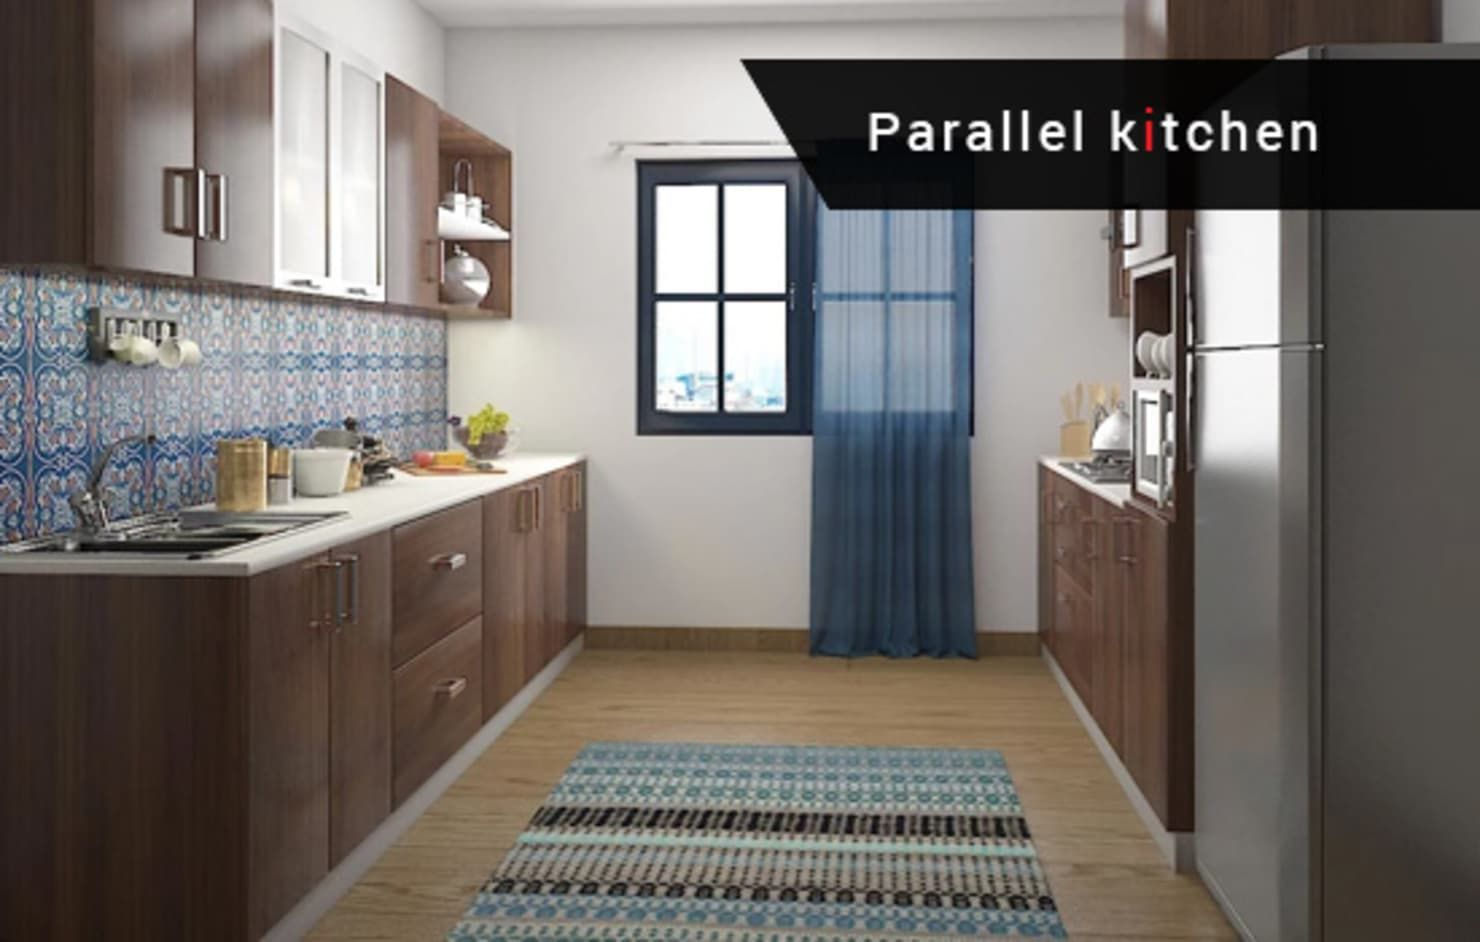 Best modular kitchen manufacturer in bangalore   homify   Parallel ...